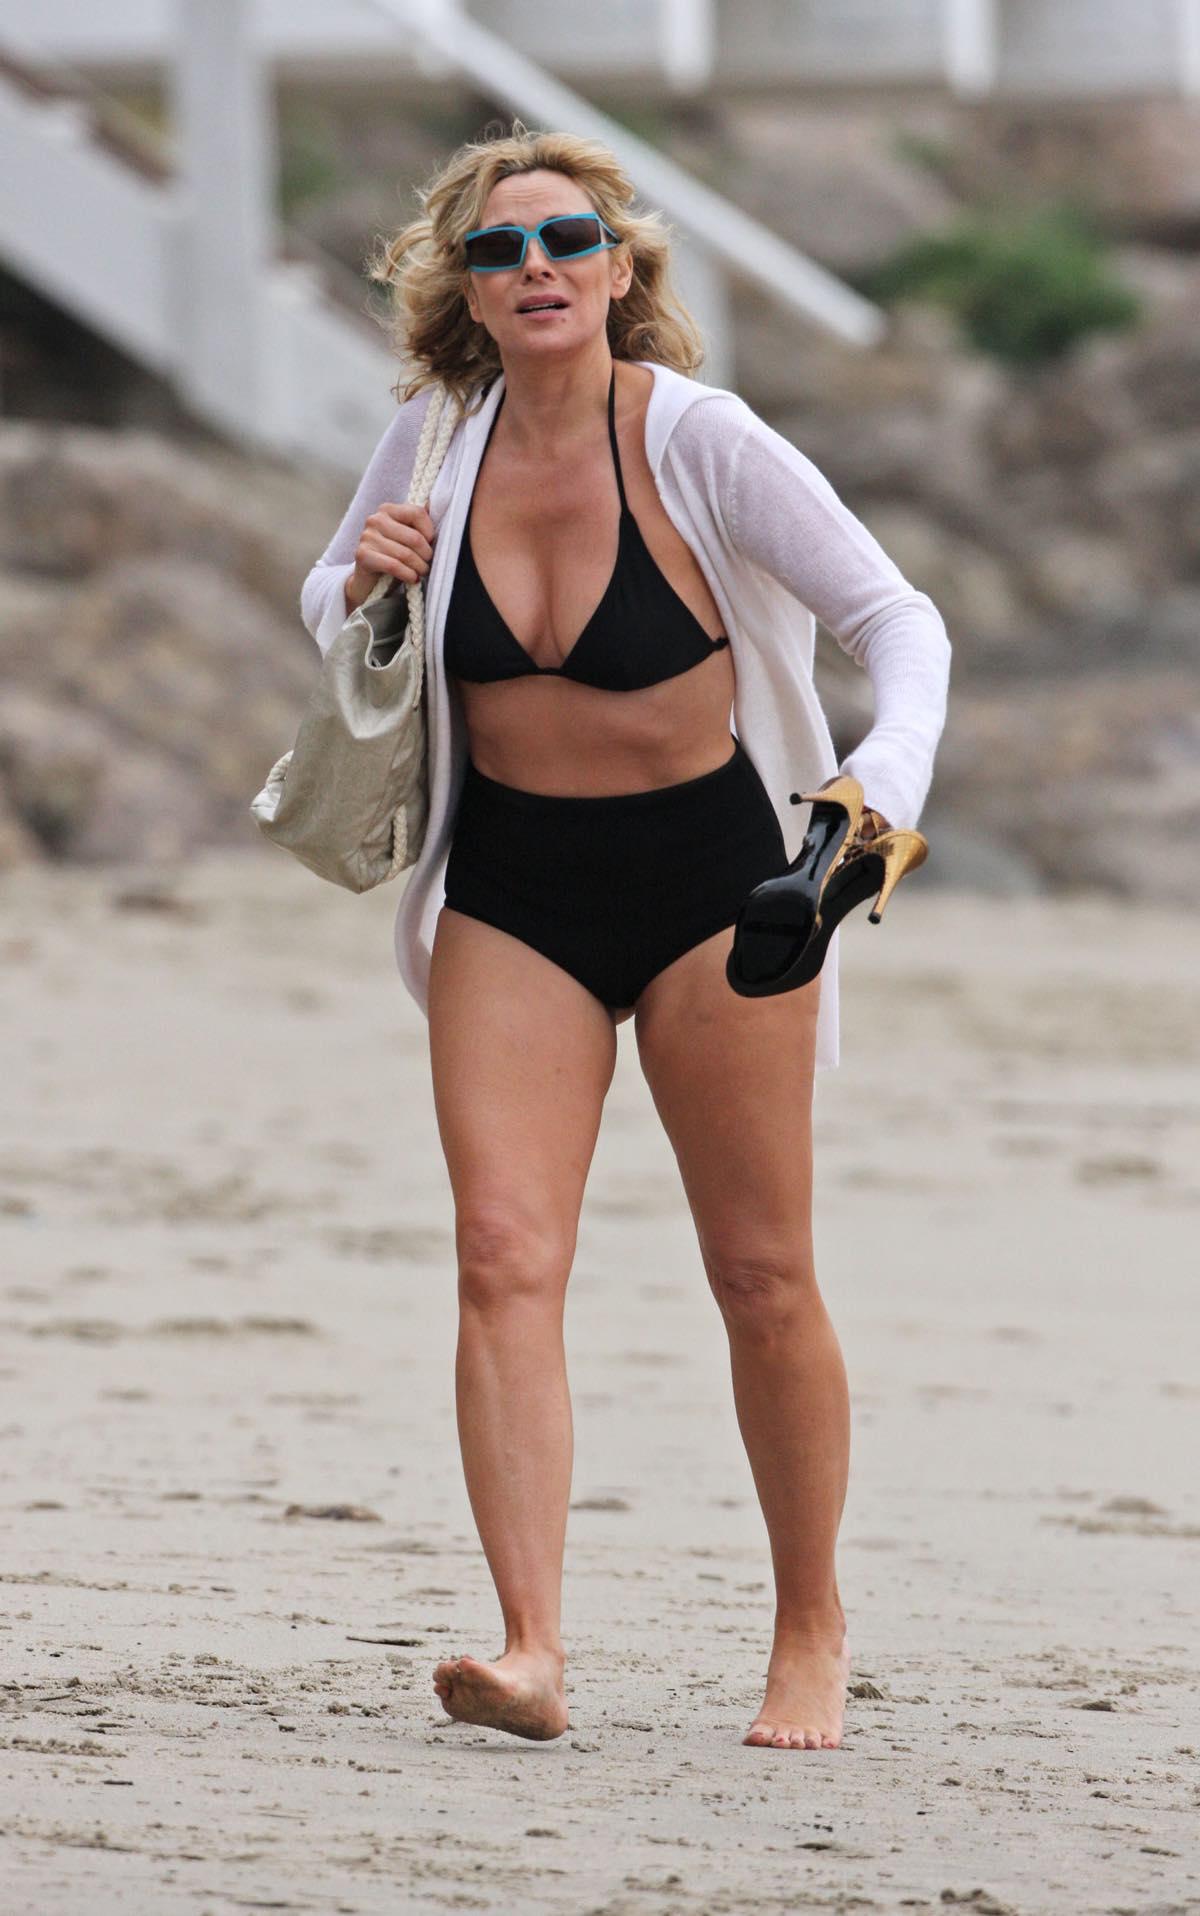 Celebrity Bikini Photo Roundup: 2007-2008